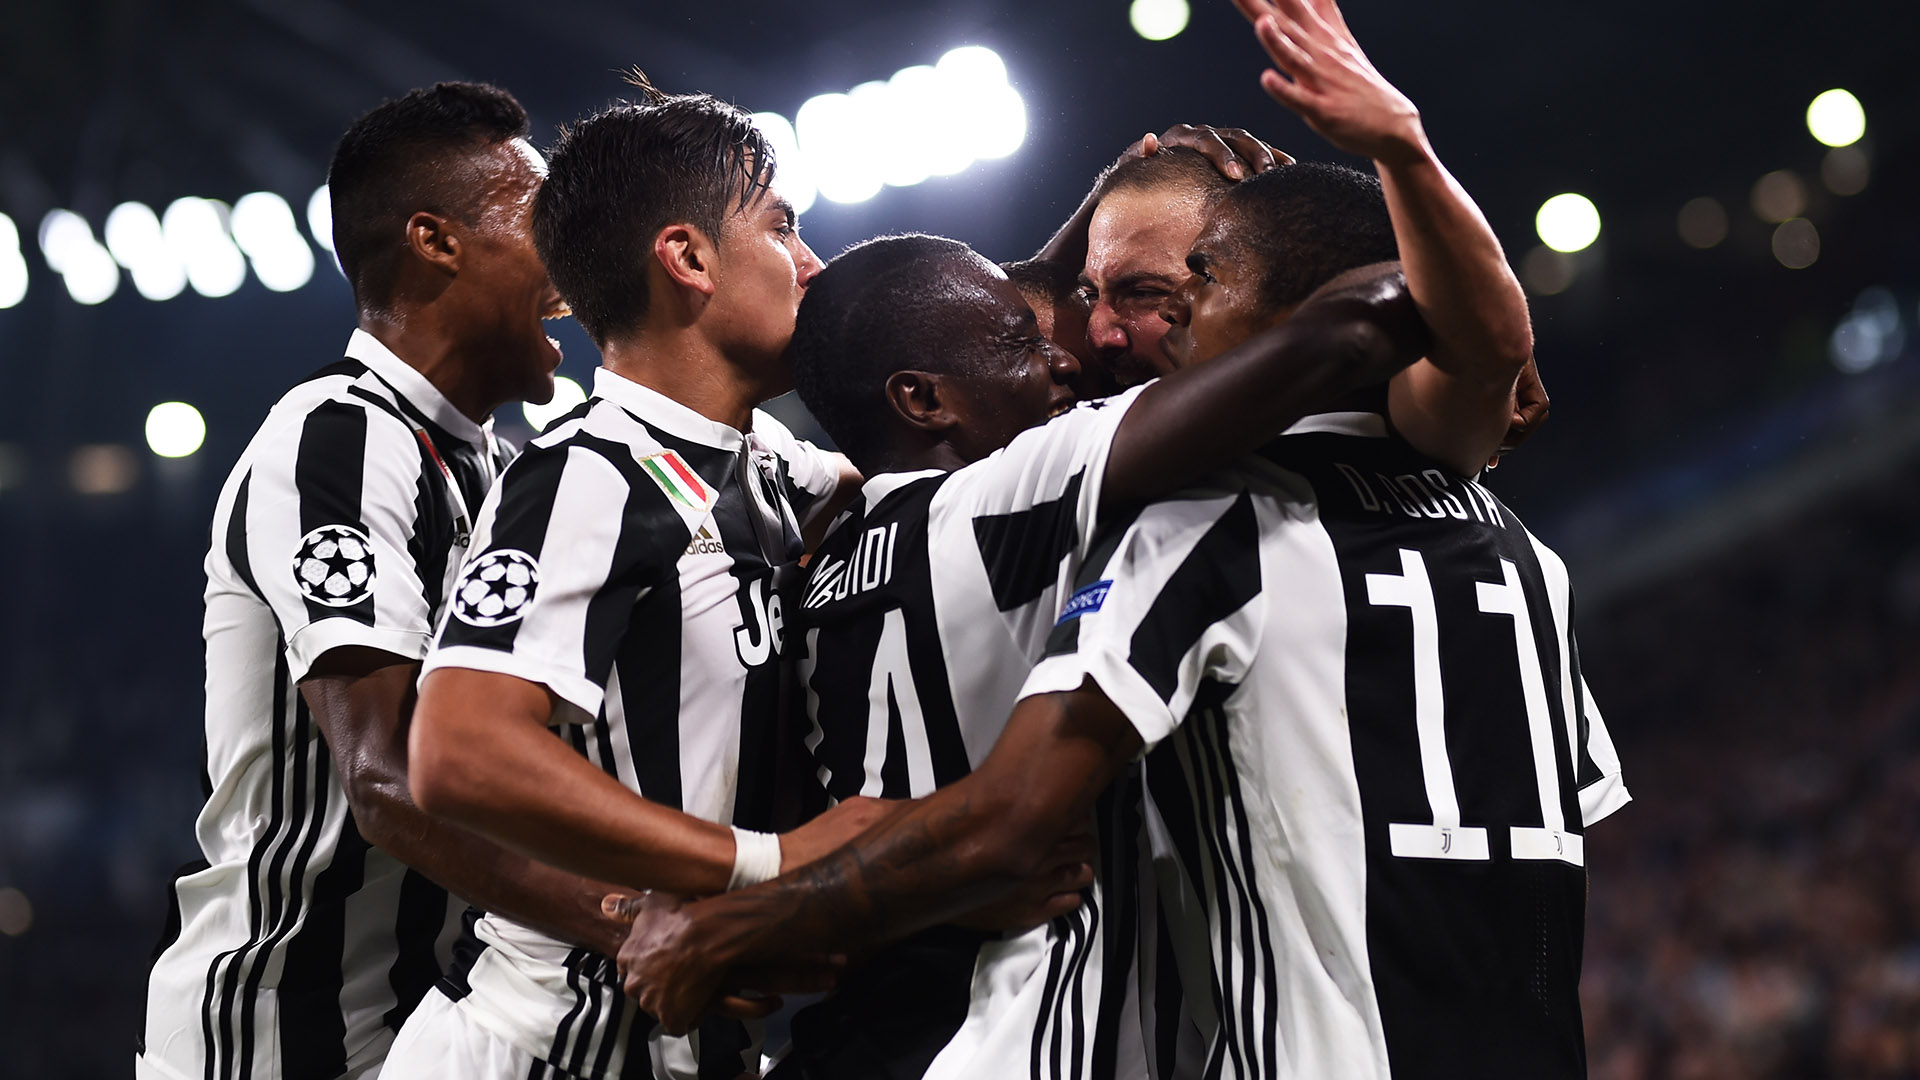 Il calcio sbarca su Netflix: la docu-serie sulla Juventus